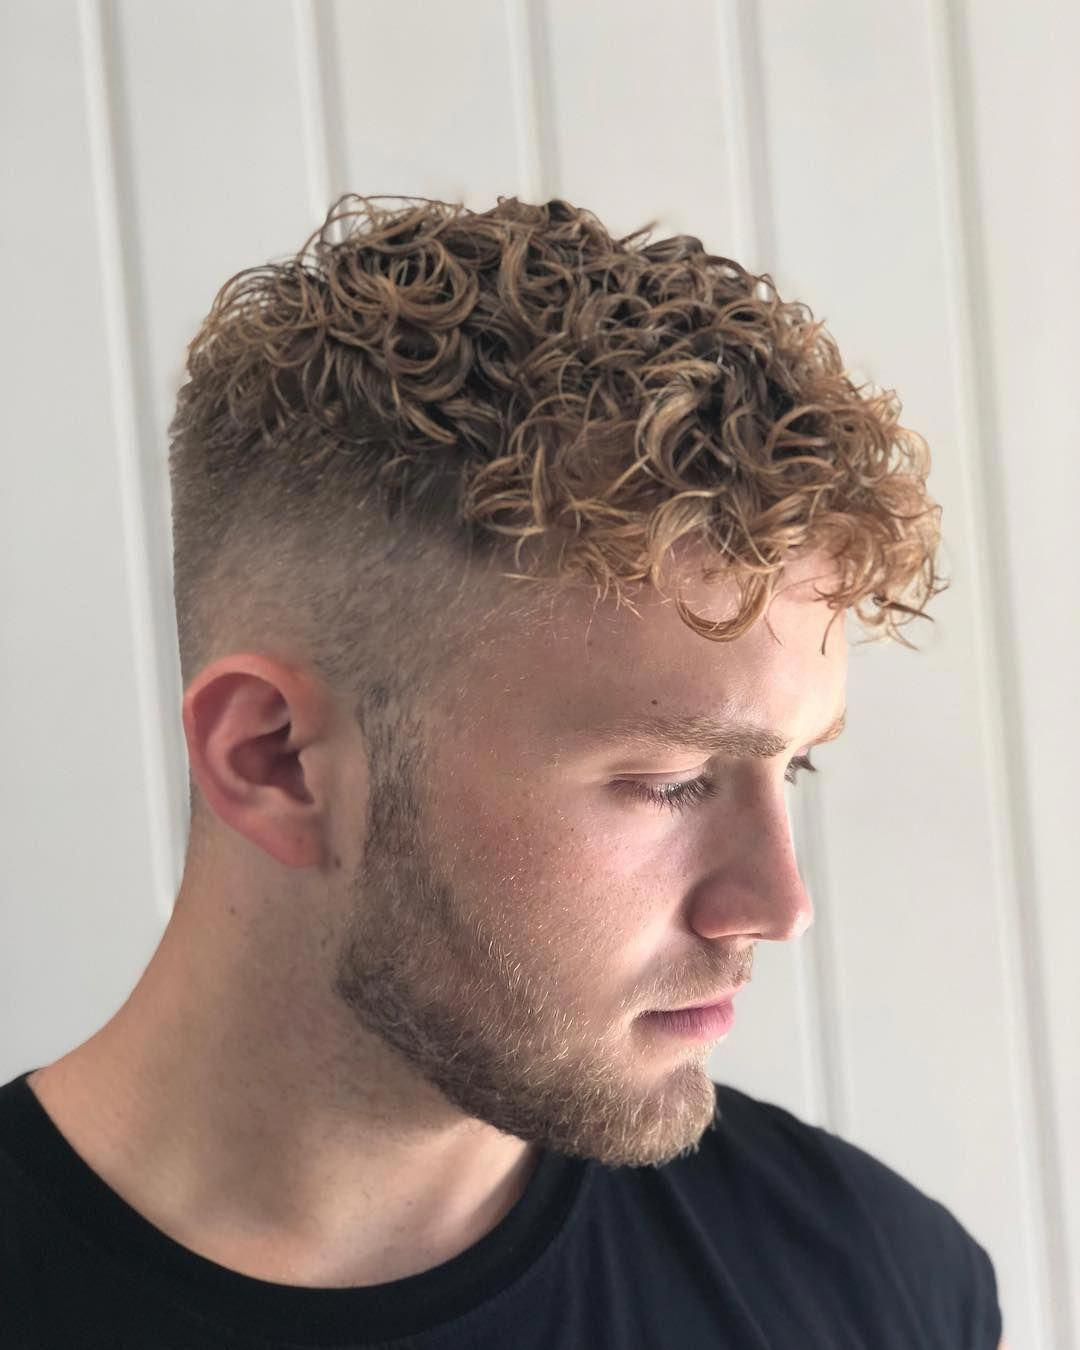 Refreshing Oscar Mcmillan Perm Perm Curls Manperm Merm Hairstyletrendsformen Short Permed Hair Permed Hairstyles Perm Curls